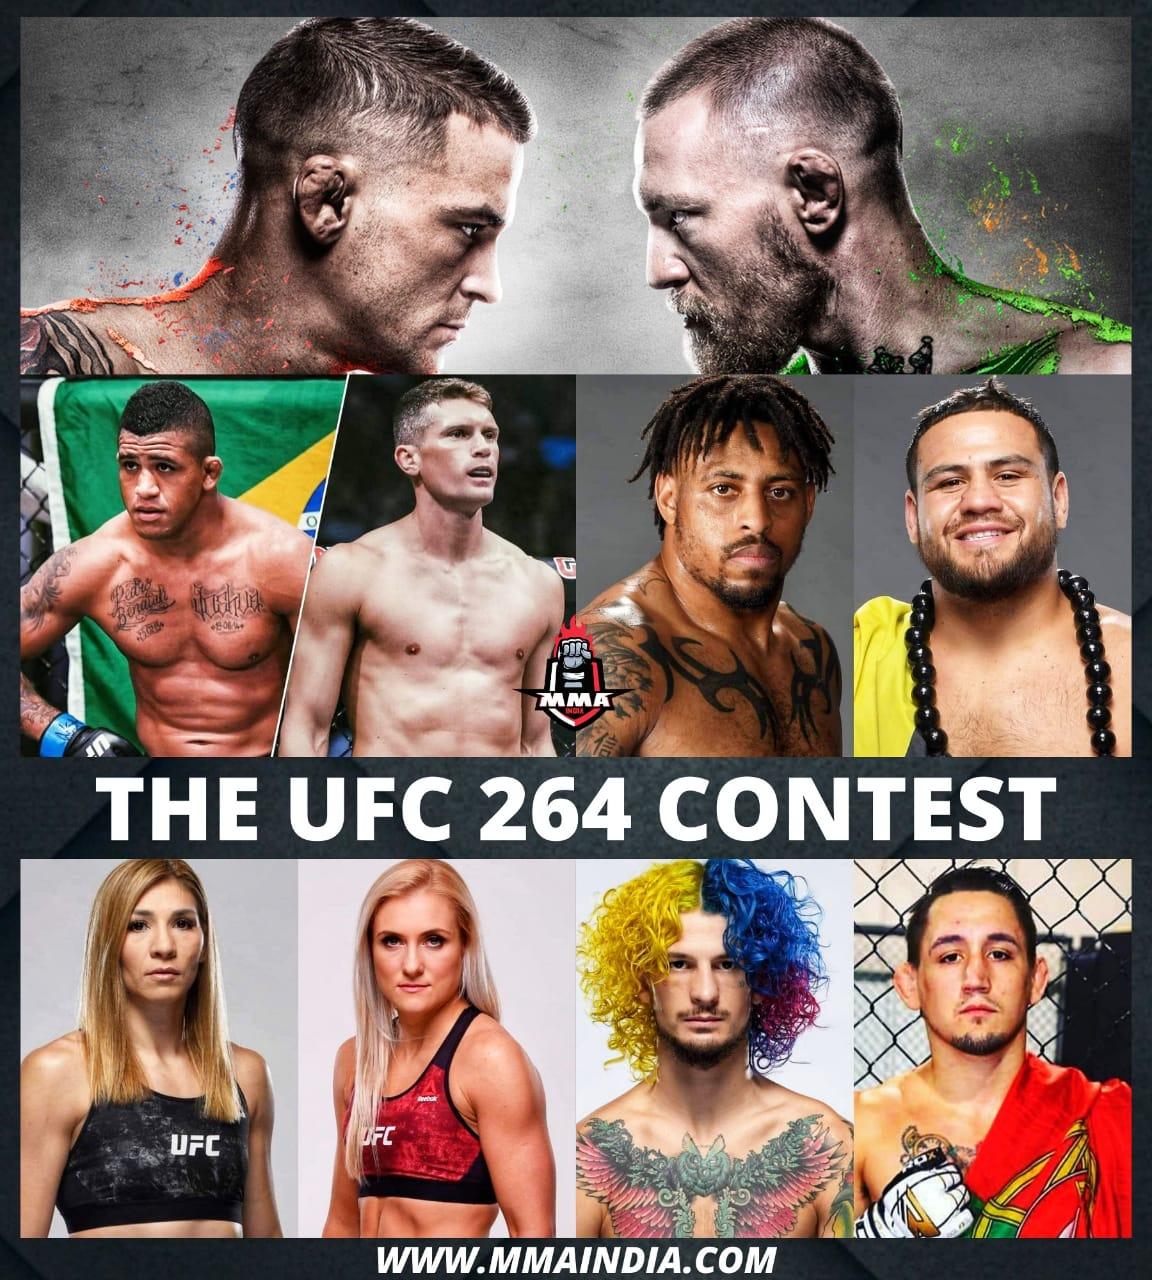 THE UFC 264 CONTEST   MMA INDIA SHOW - UFC 264